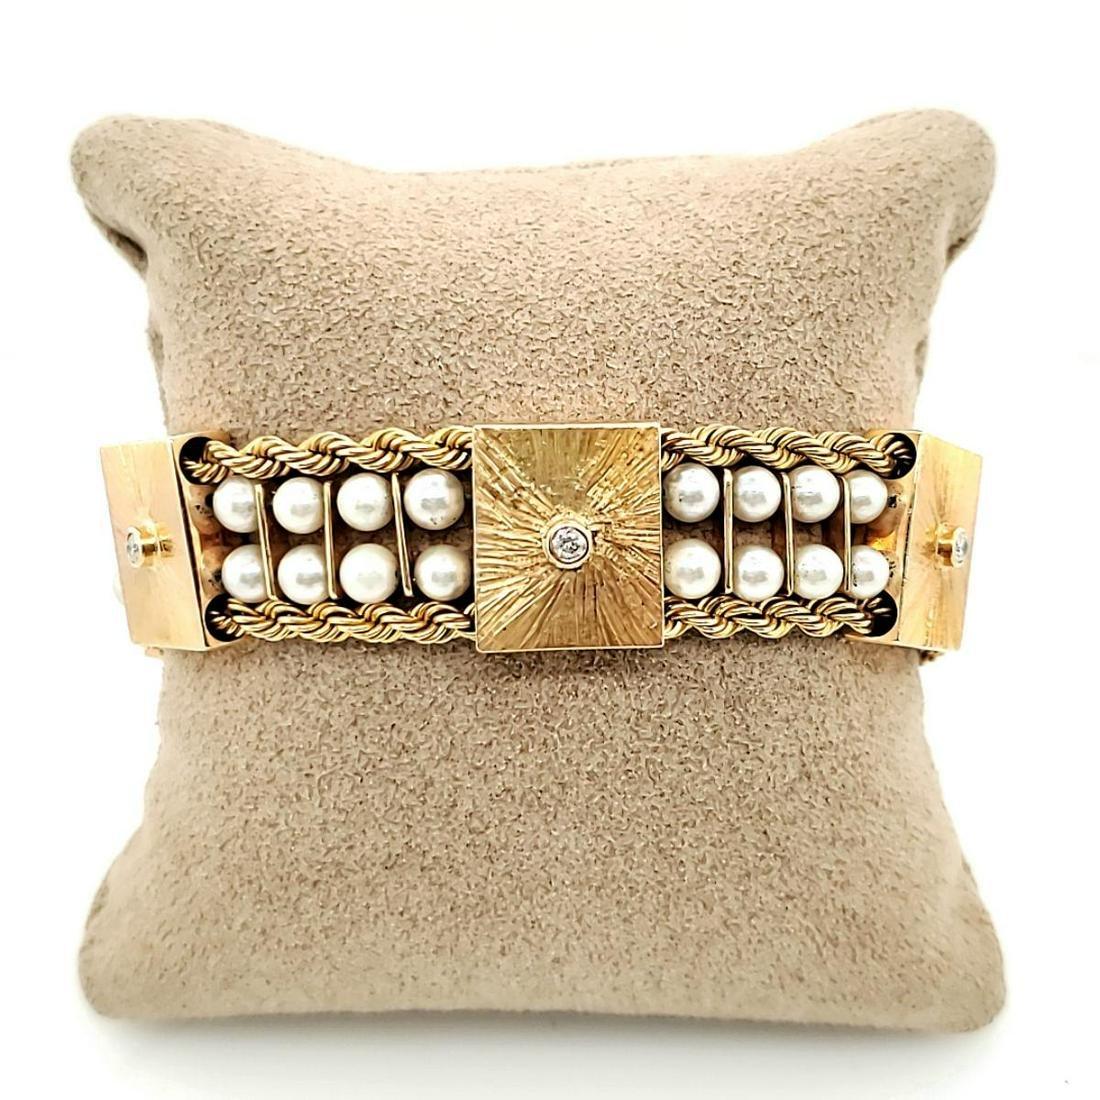 14kt yellow gold pearl bracelet